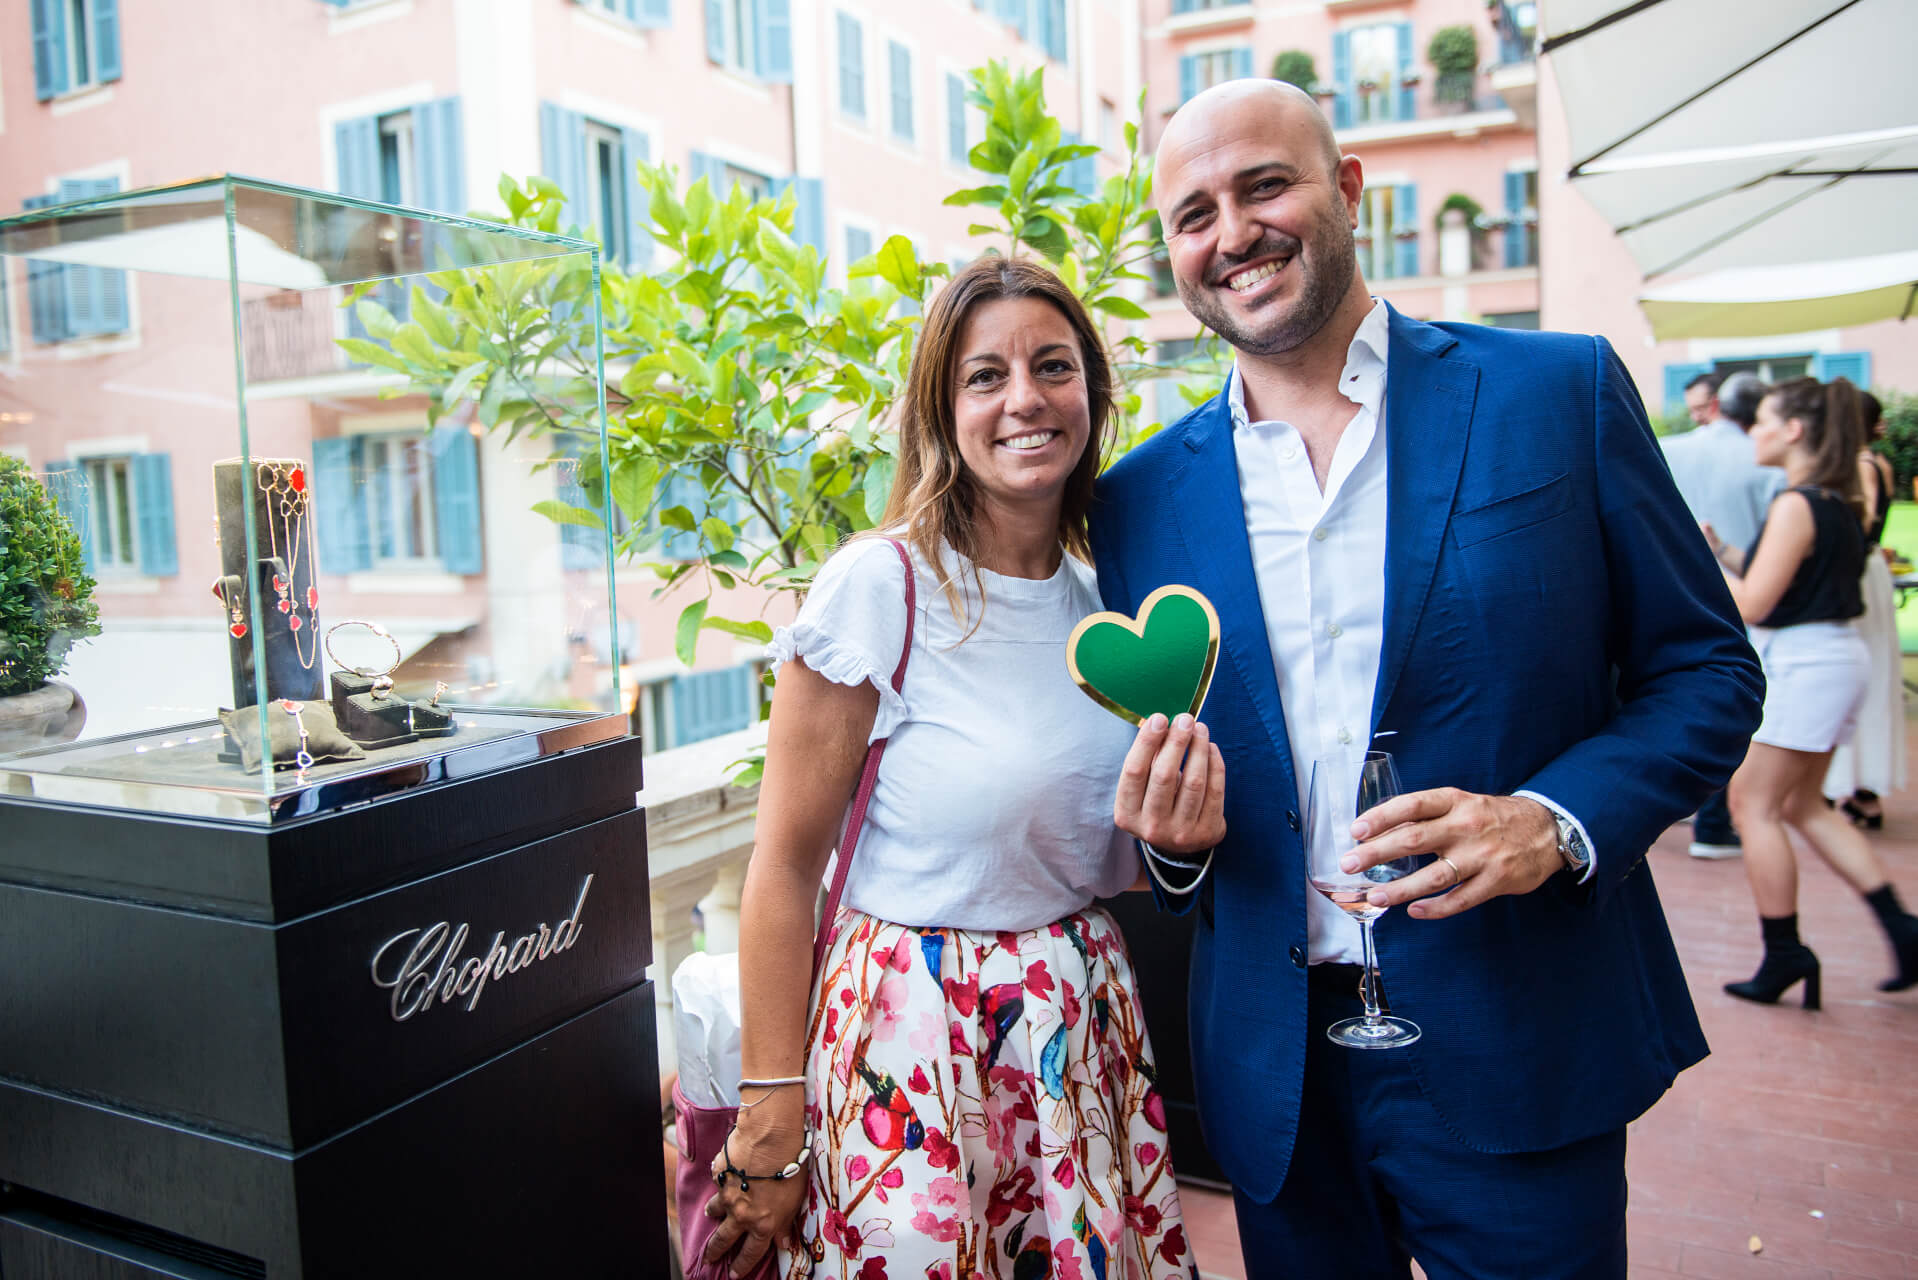 Vanessa Biagioli, Matteo Moretti